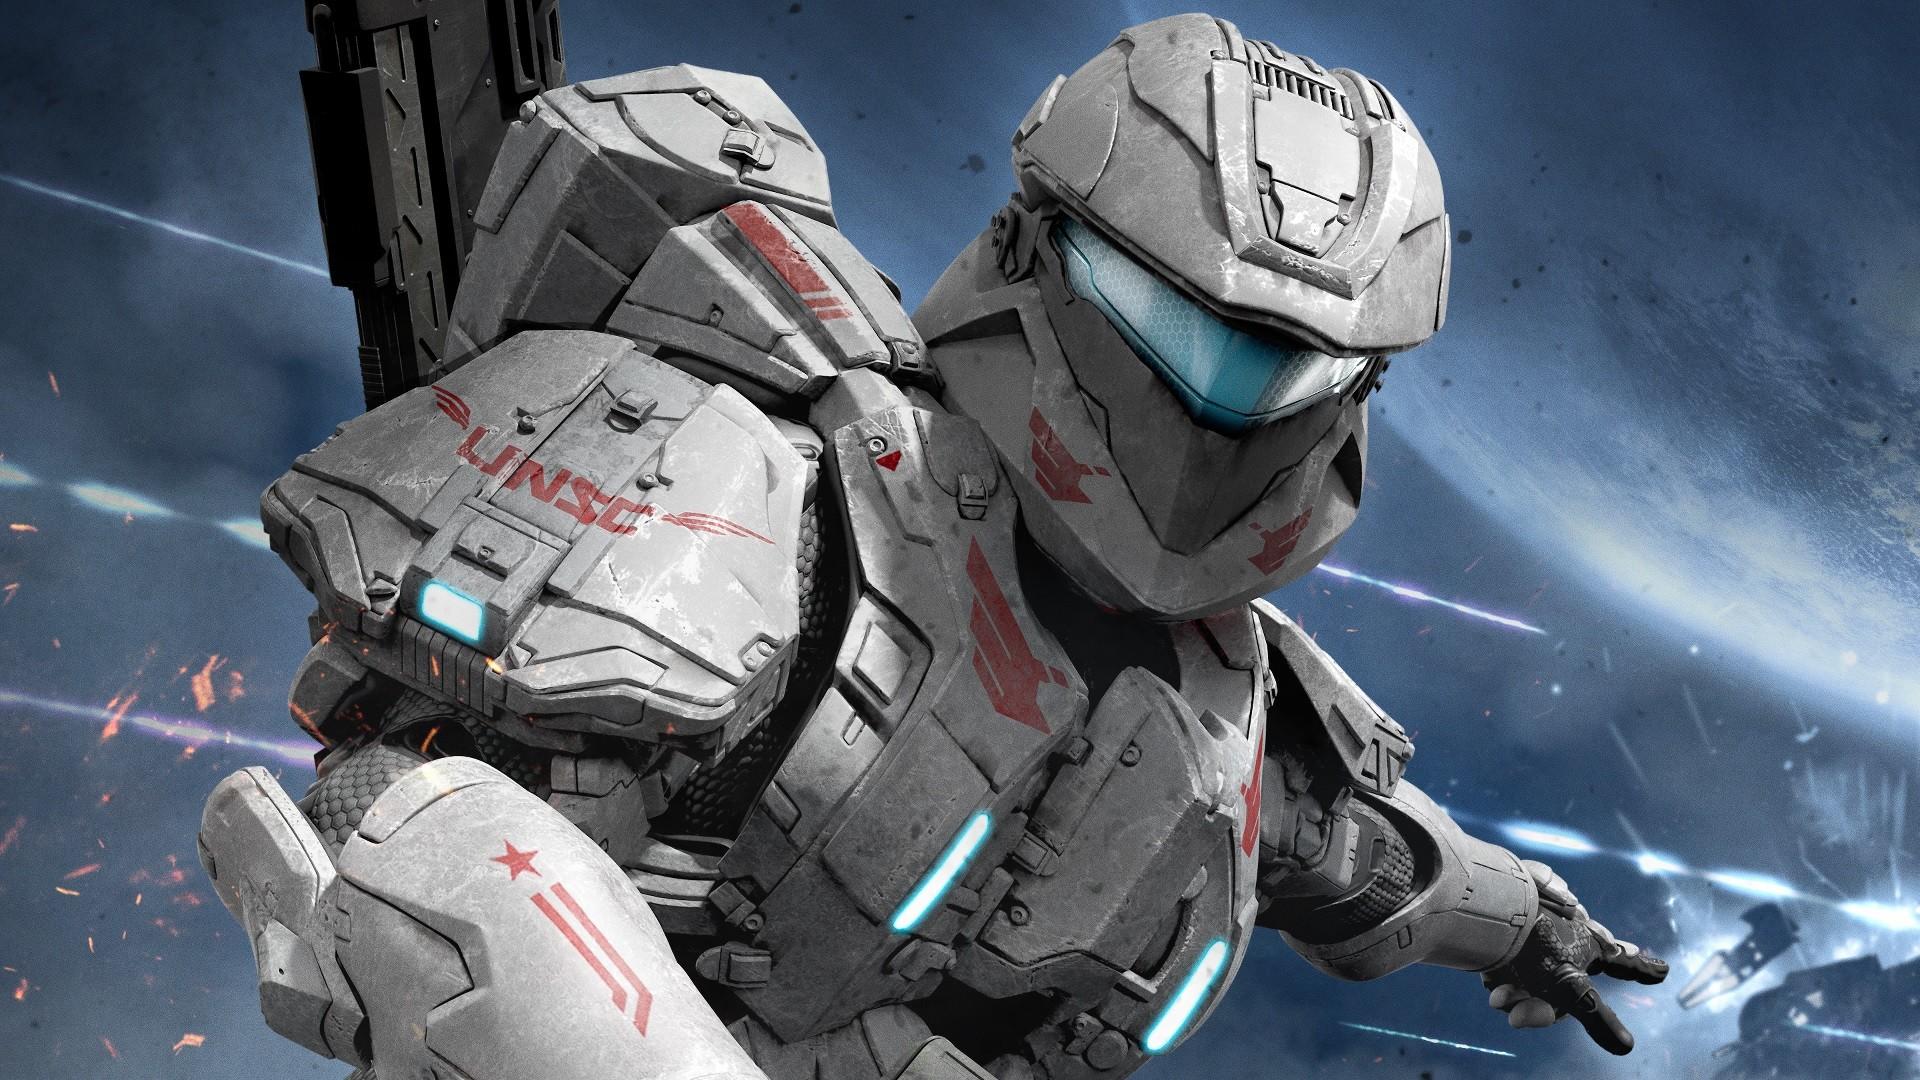 Res: 1920x1080, Wallpaper #18 Wallpaper from Halo: Spartan Assault